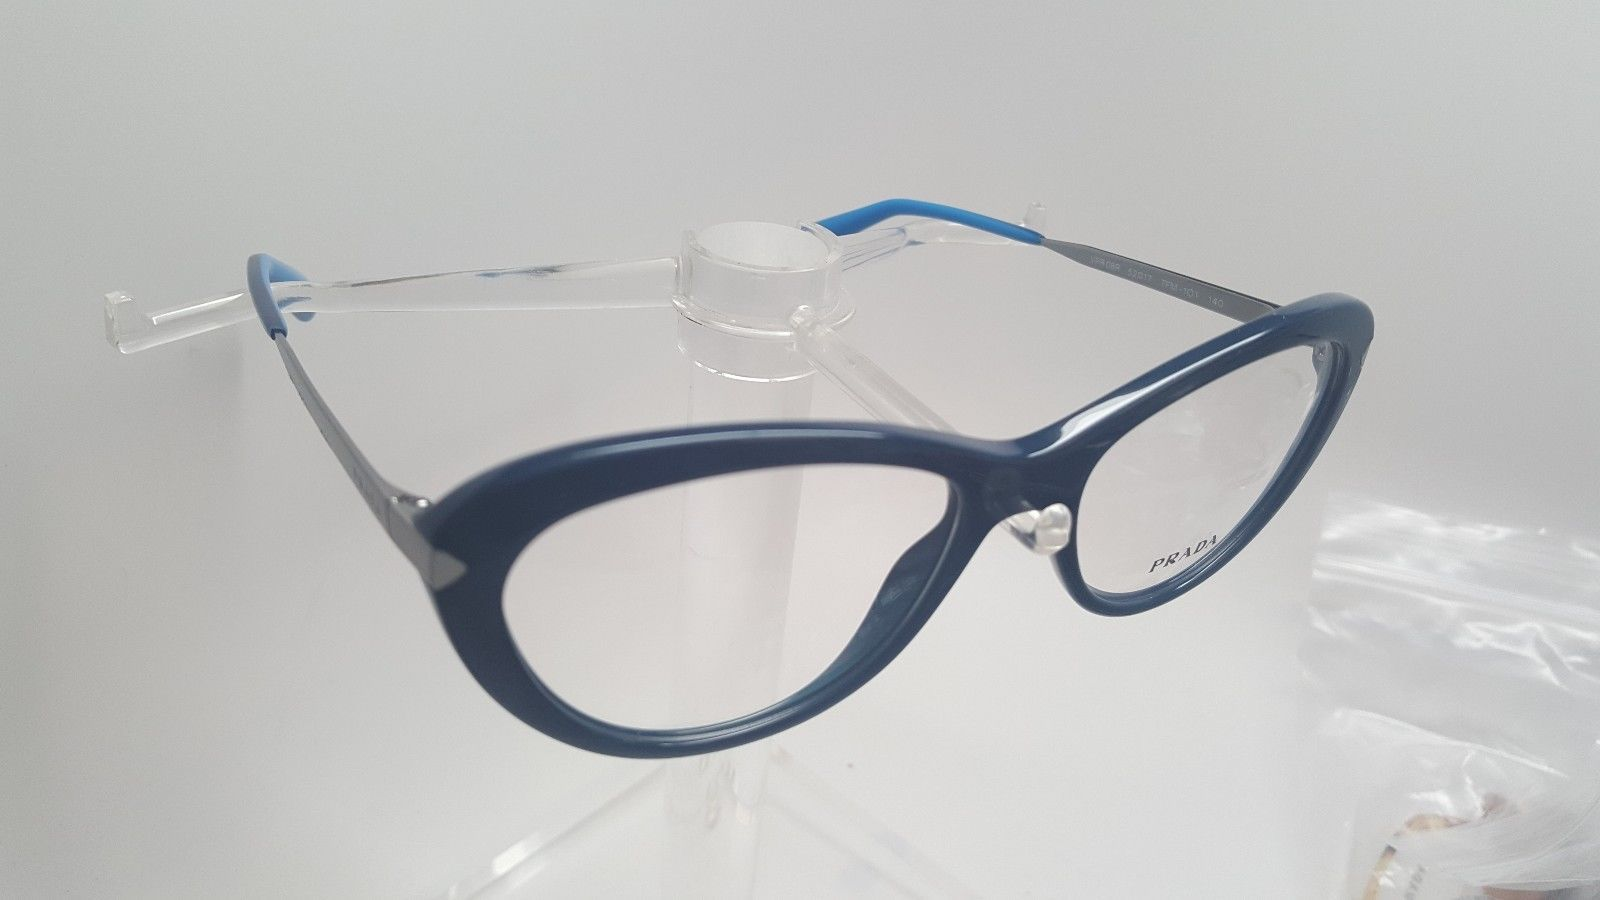 Royal Blue Glasses Frames : NEW PRADA VPR 08R TFM-101 ROYAL BLUE EYEGLASSES AUTHENTIC ...